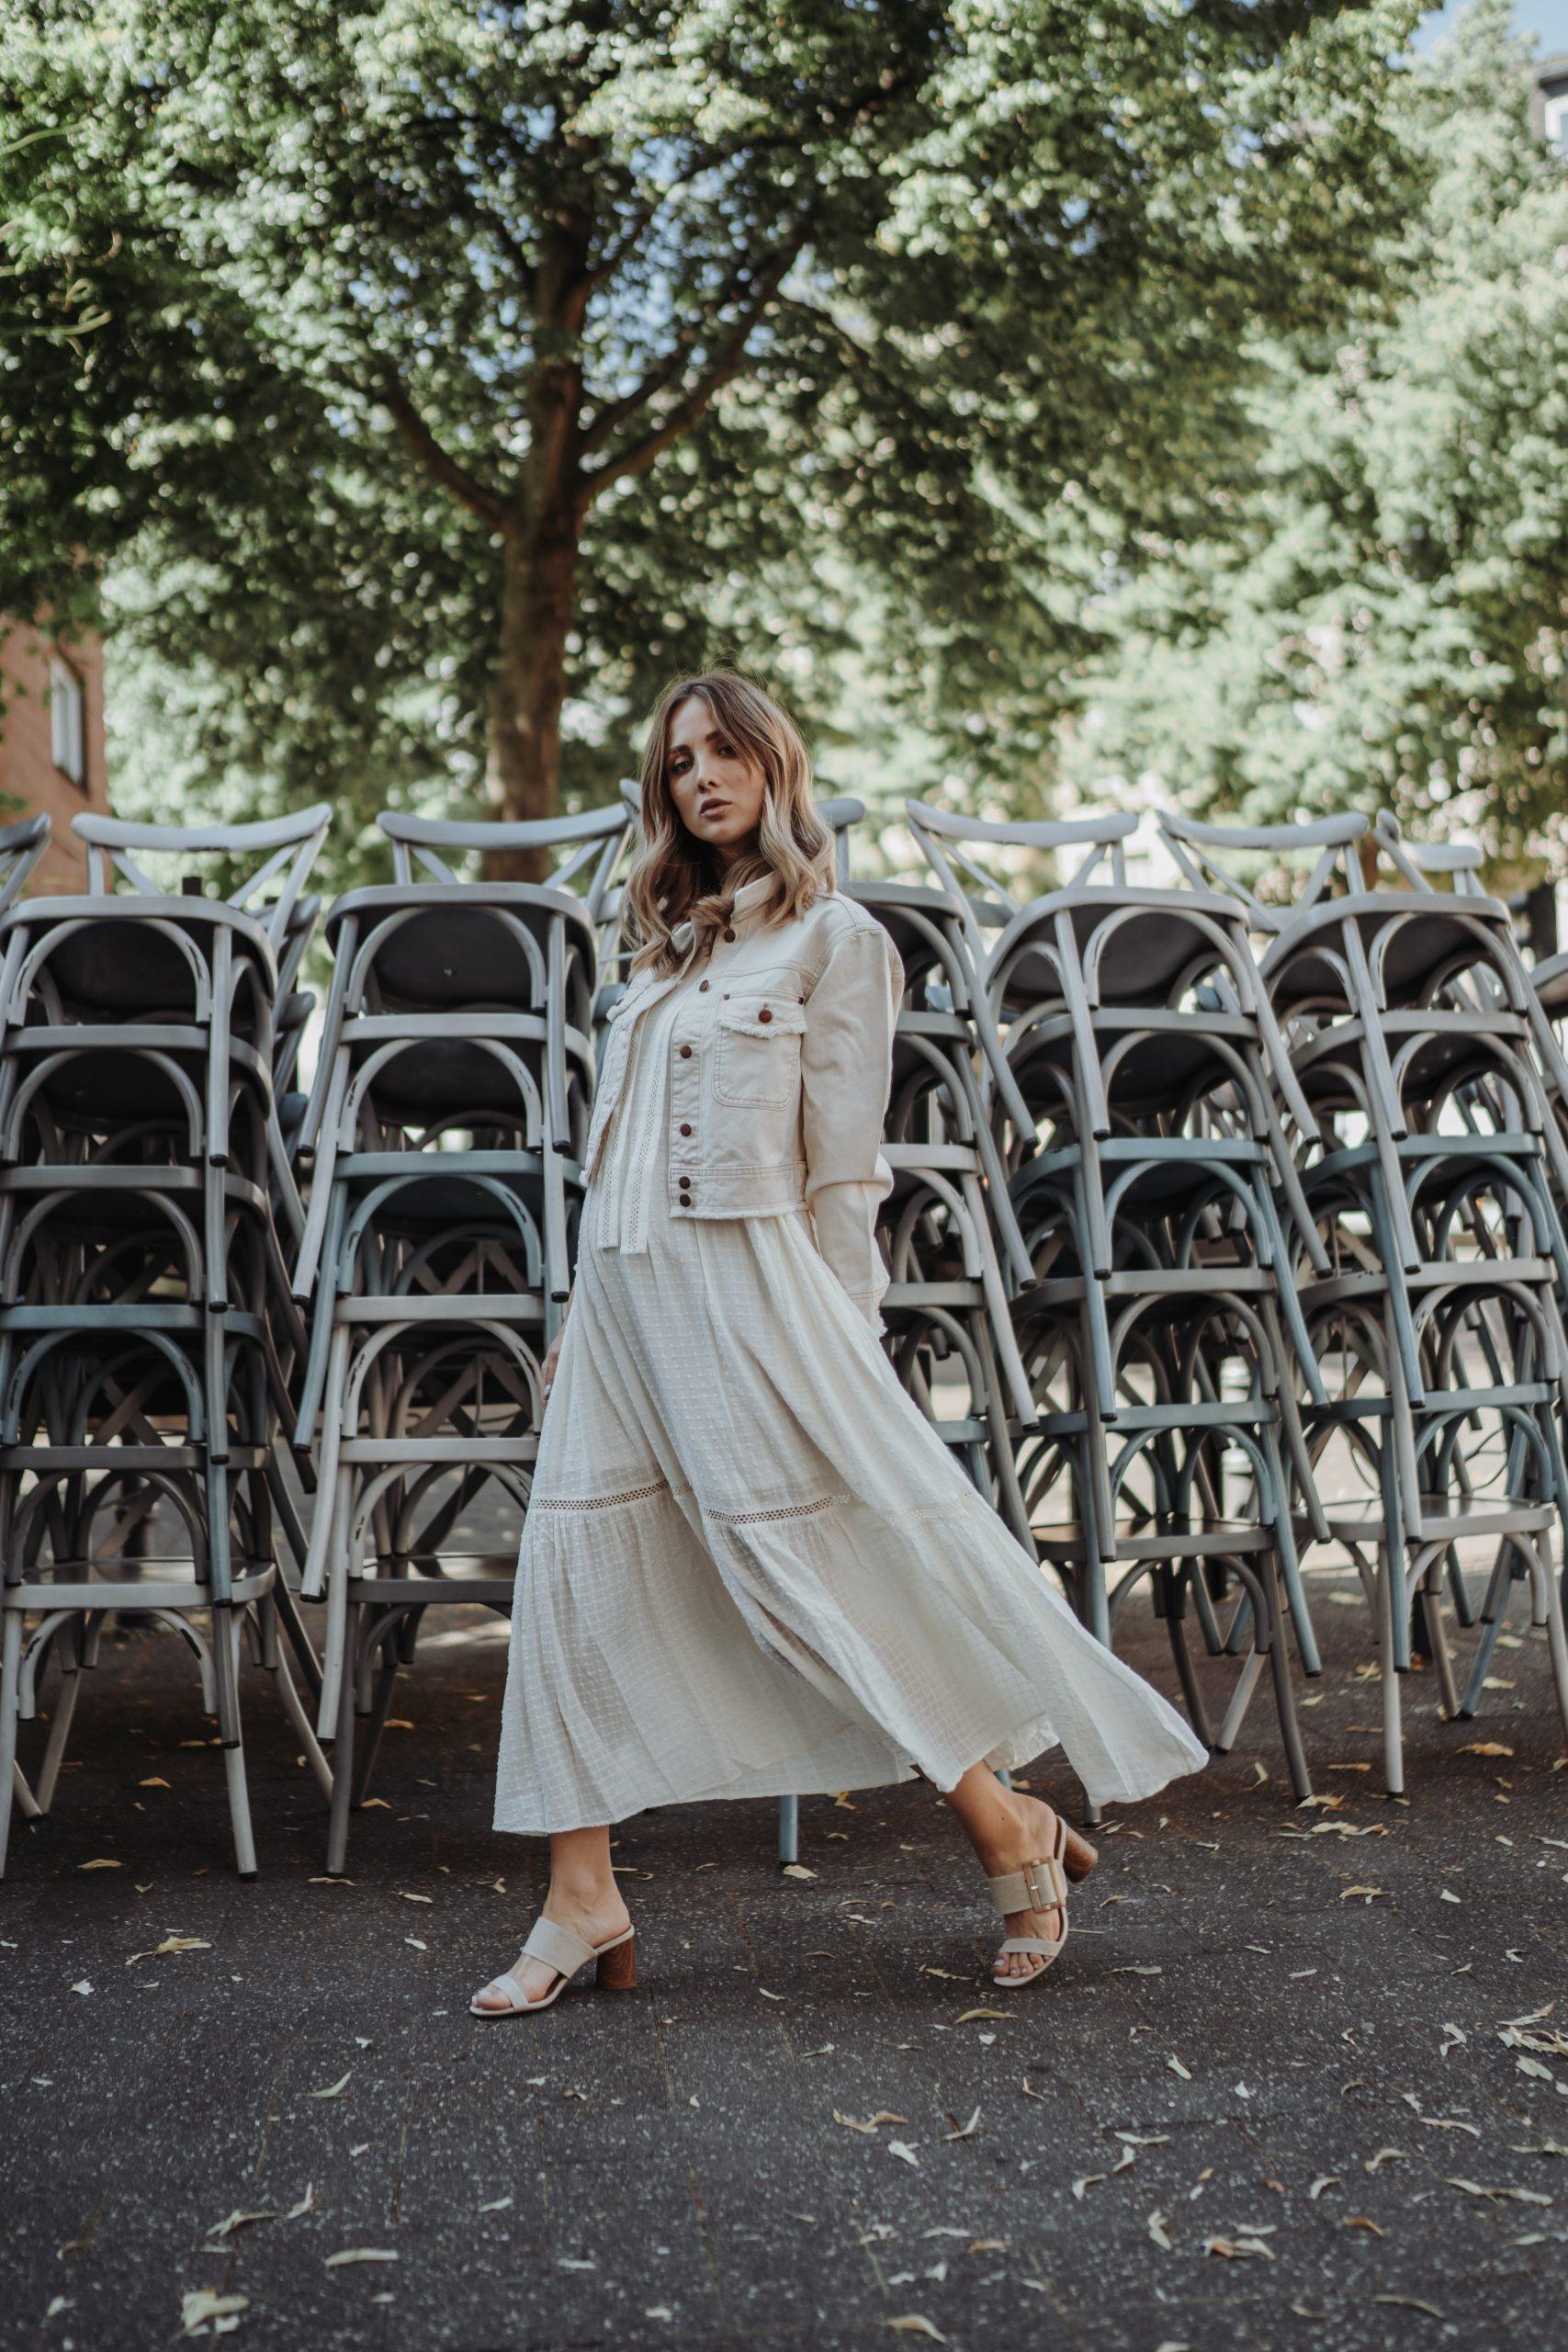 meine sommer 2020 looks im amazon fashion sale - carmushka